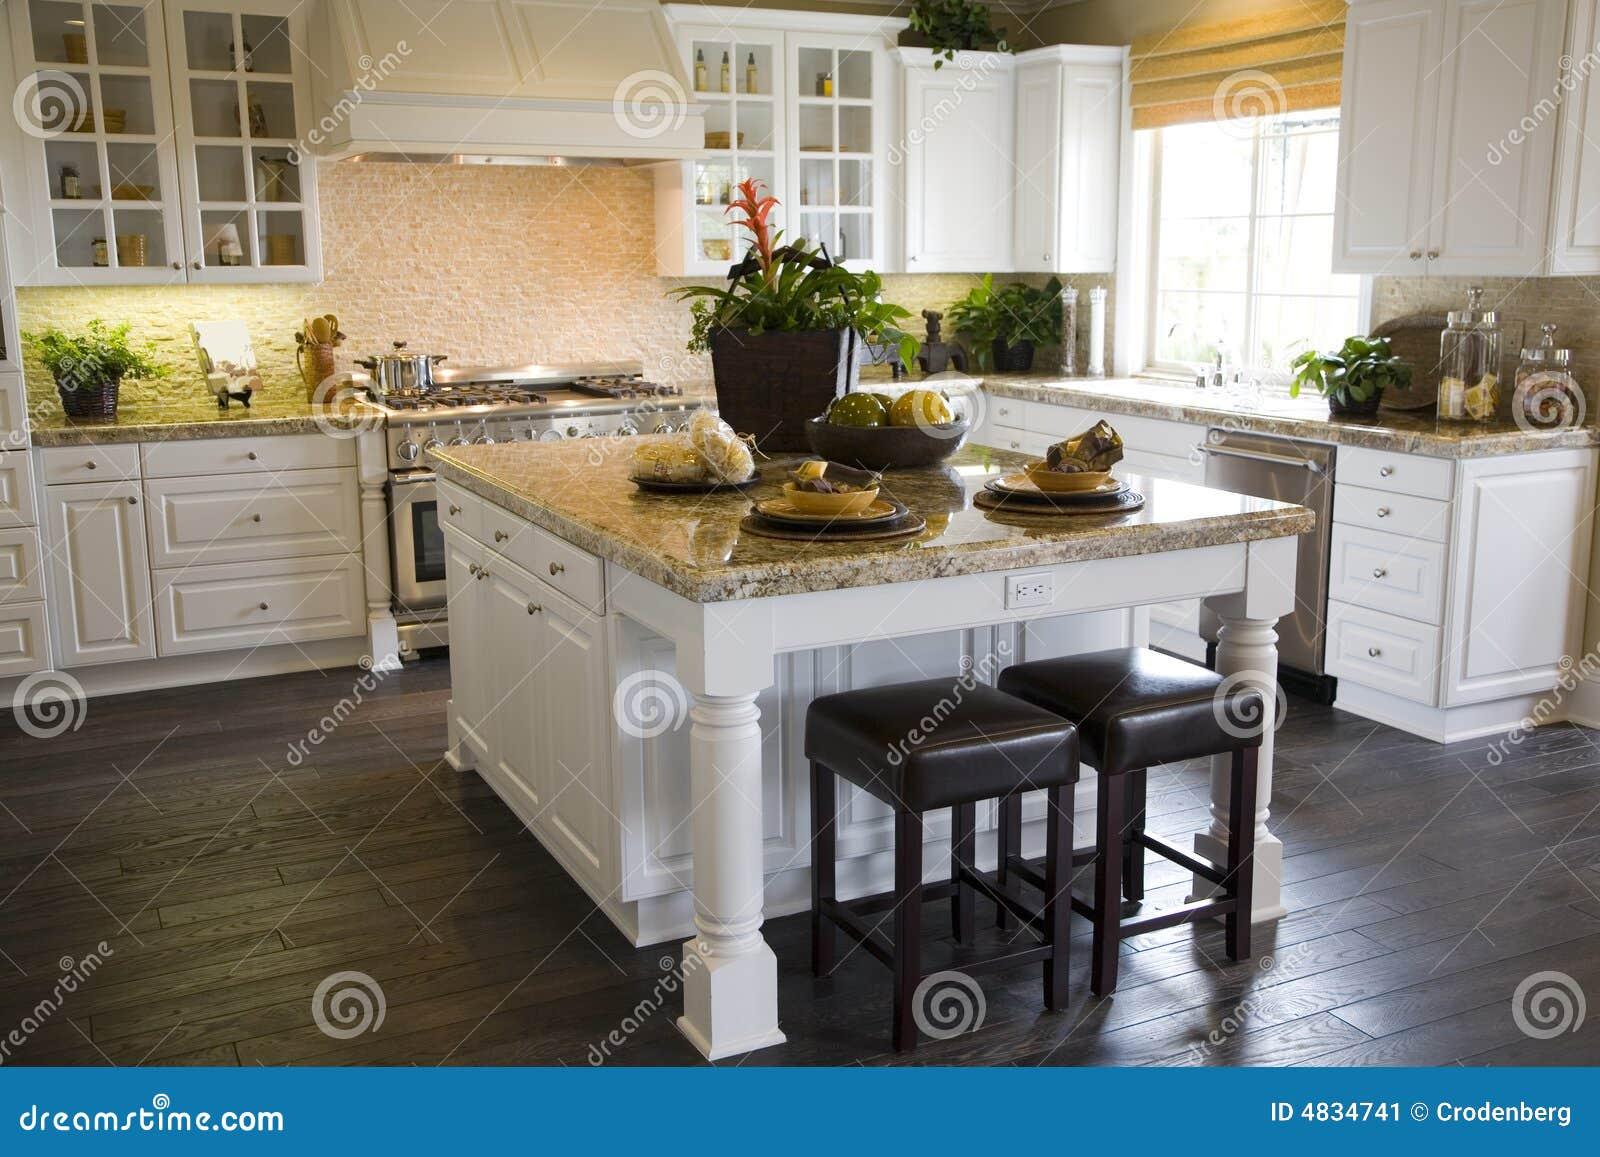 Kuchnia luksusu w domu